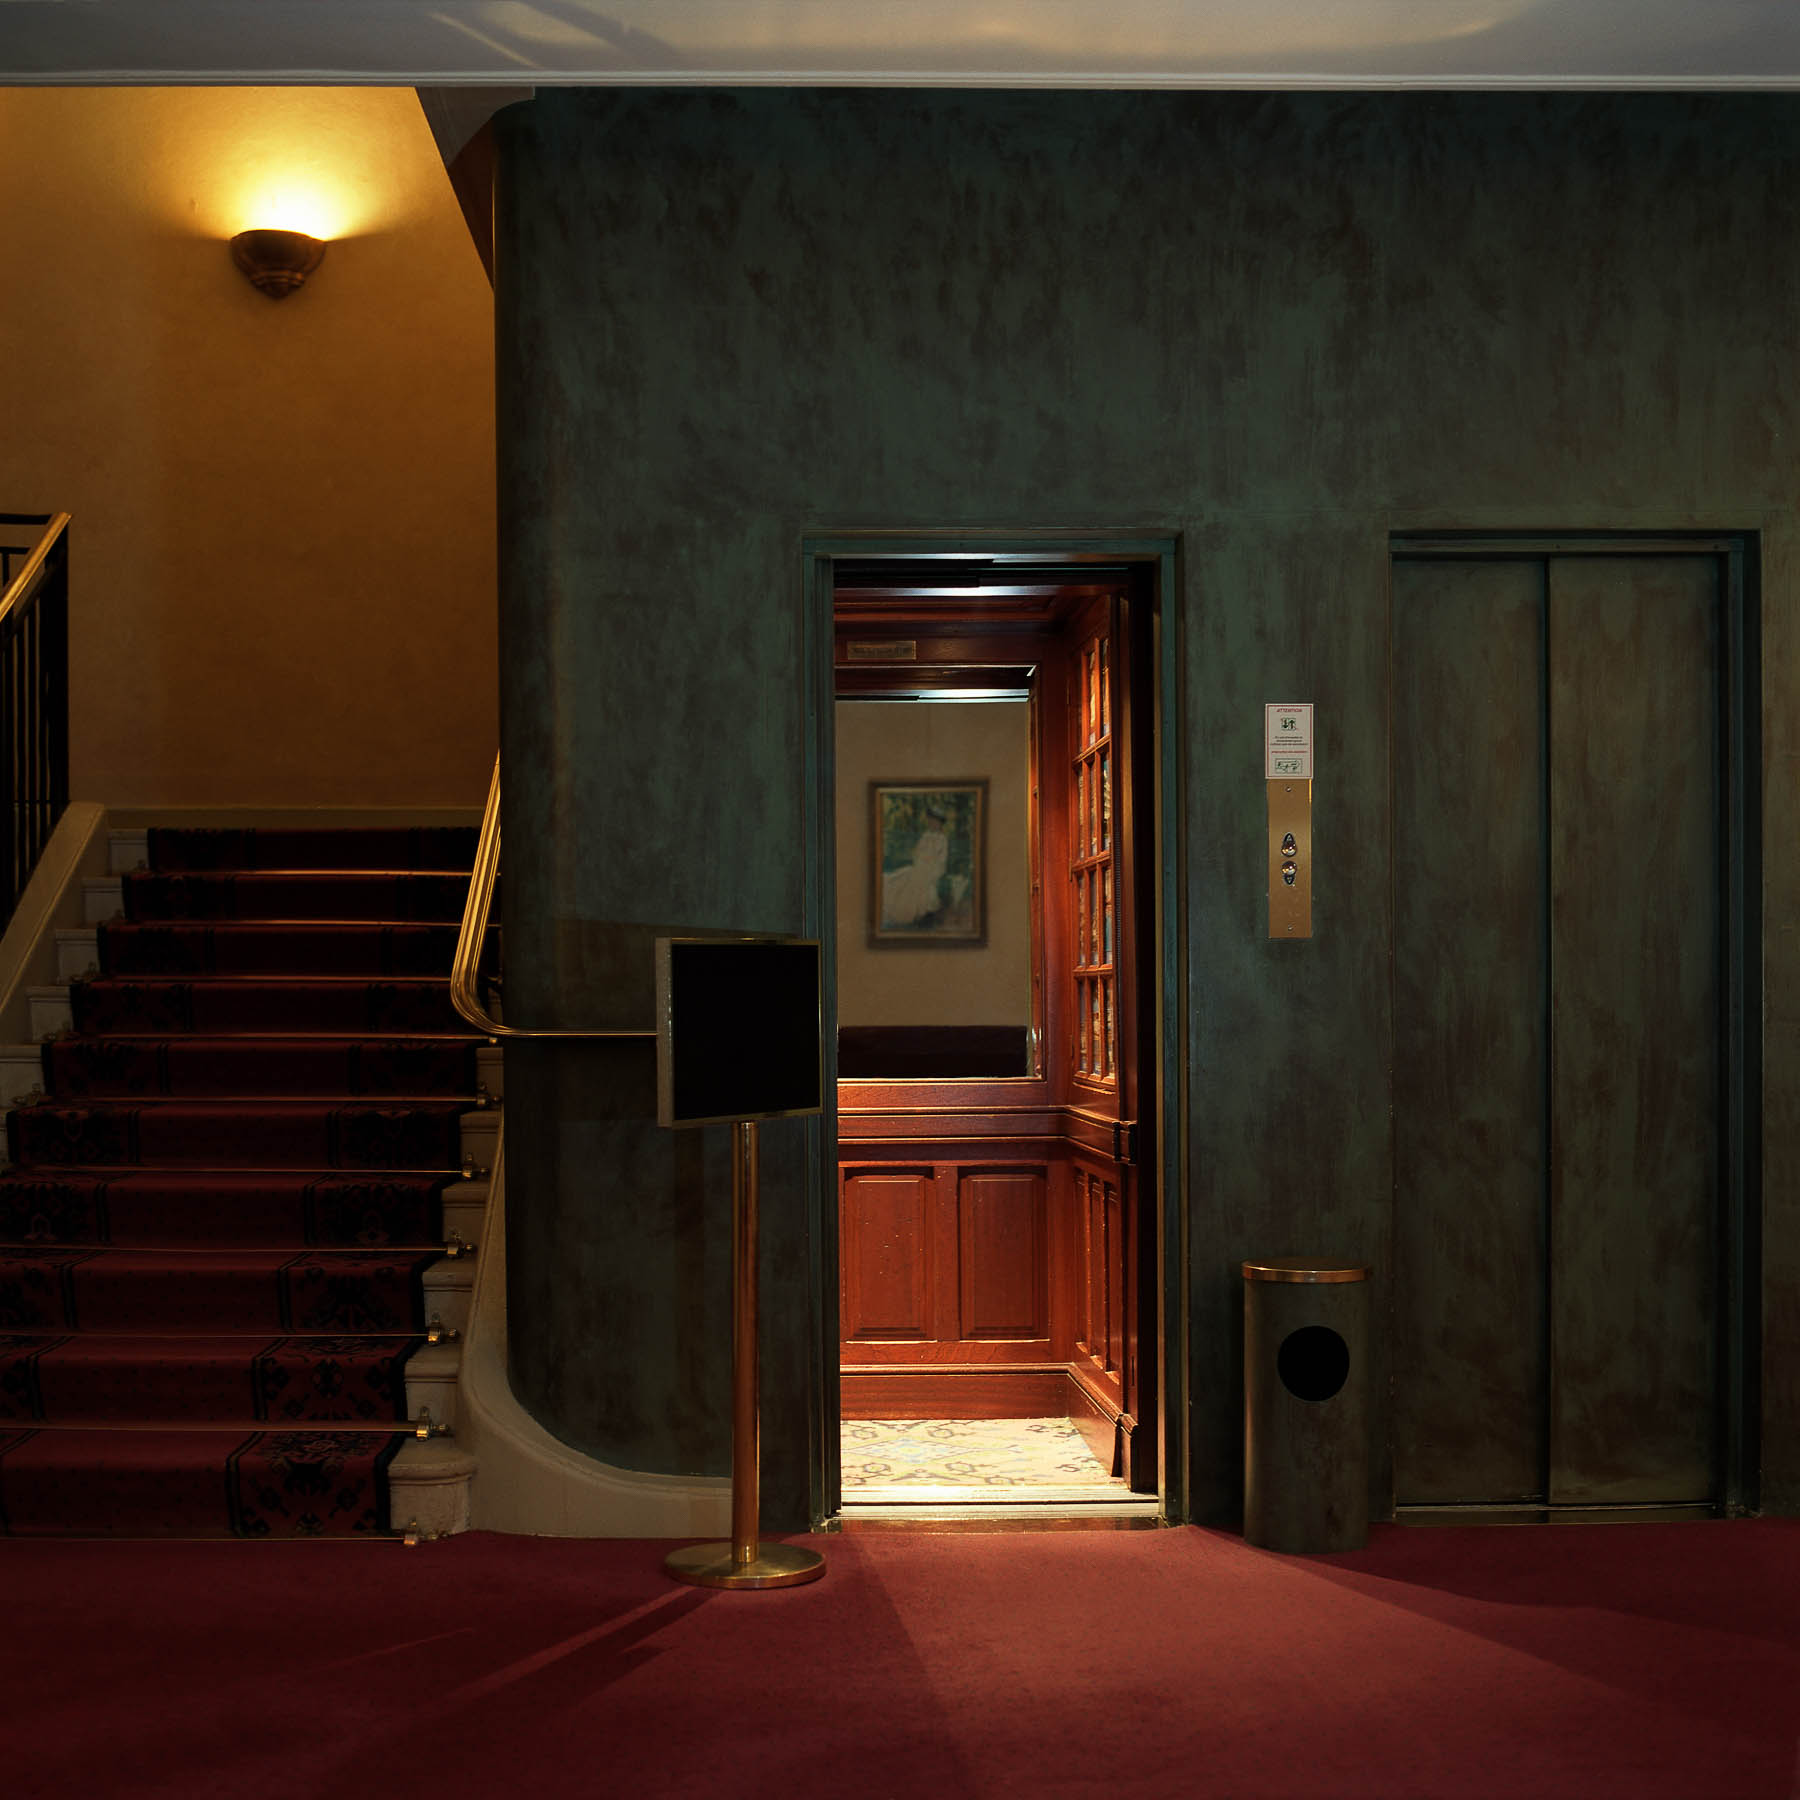 02_david_picchiottino_room_hotel_01_2014-1-4.jpg